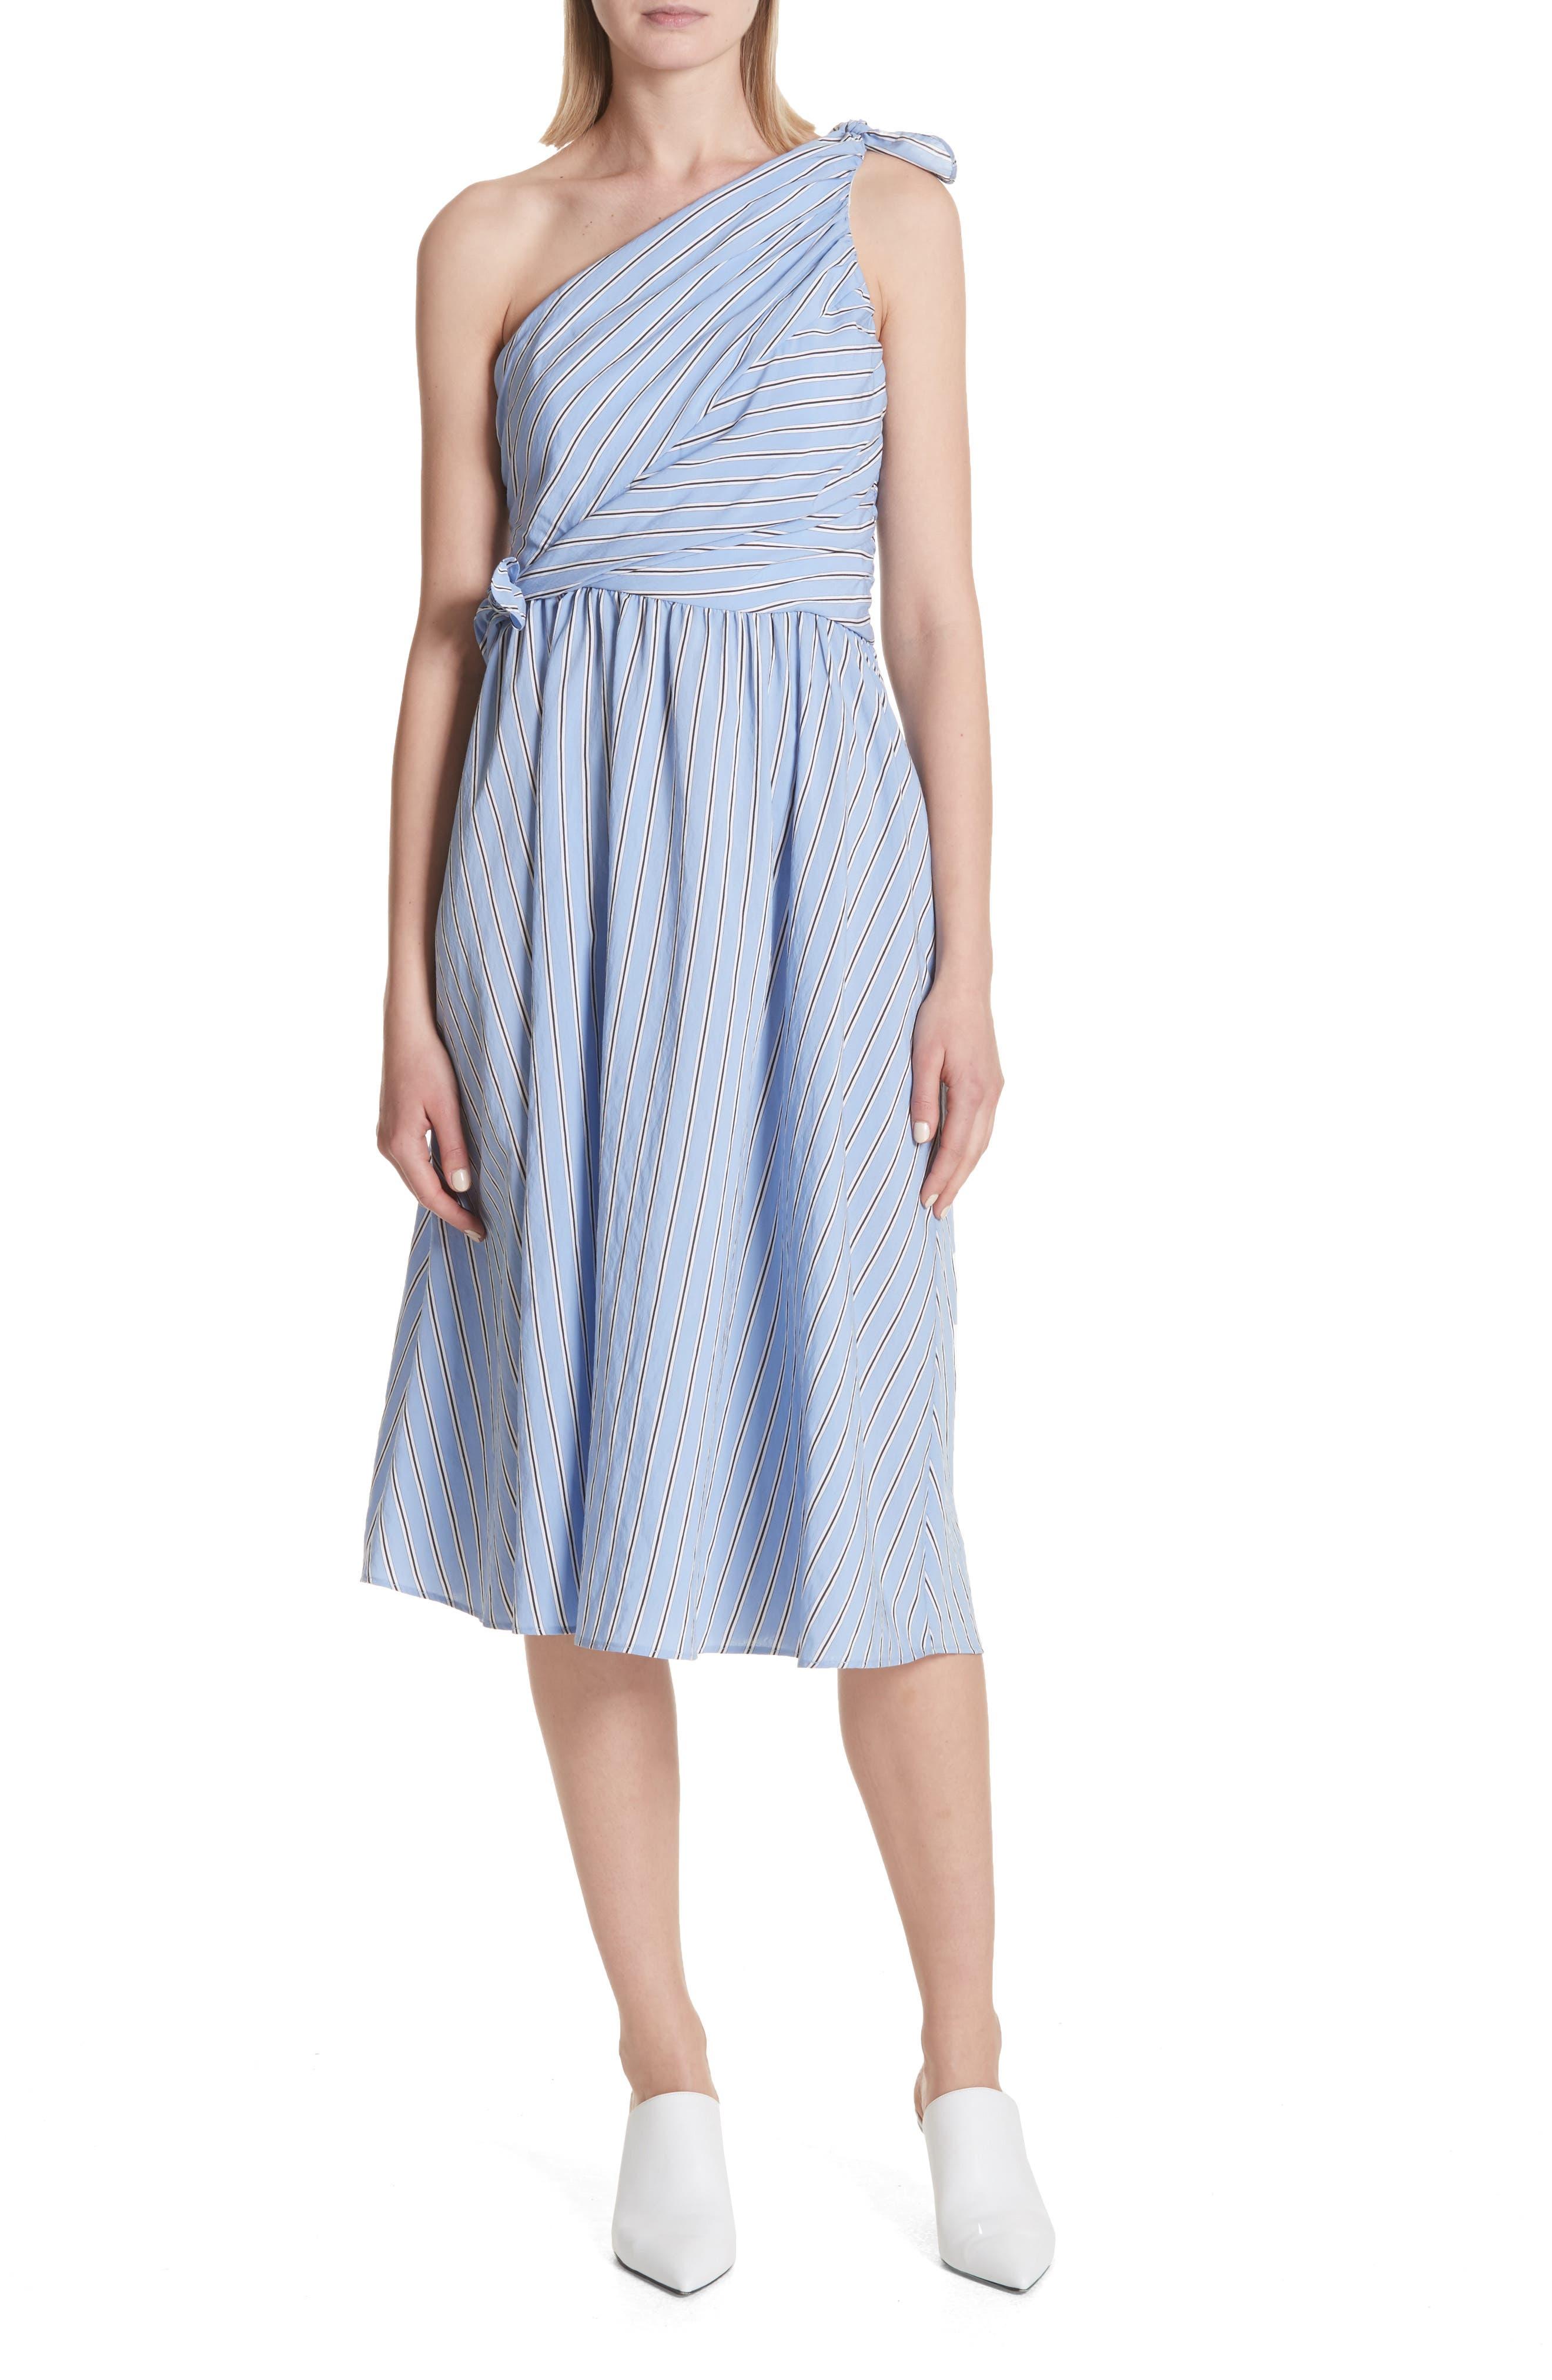 Cabrera Stripe One-Shoulder Dress,                             Main thumbnail 1, color,                             420